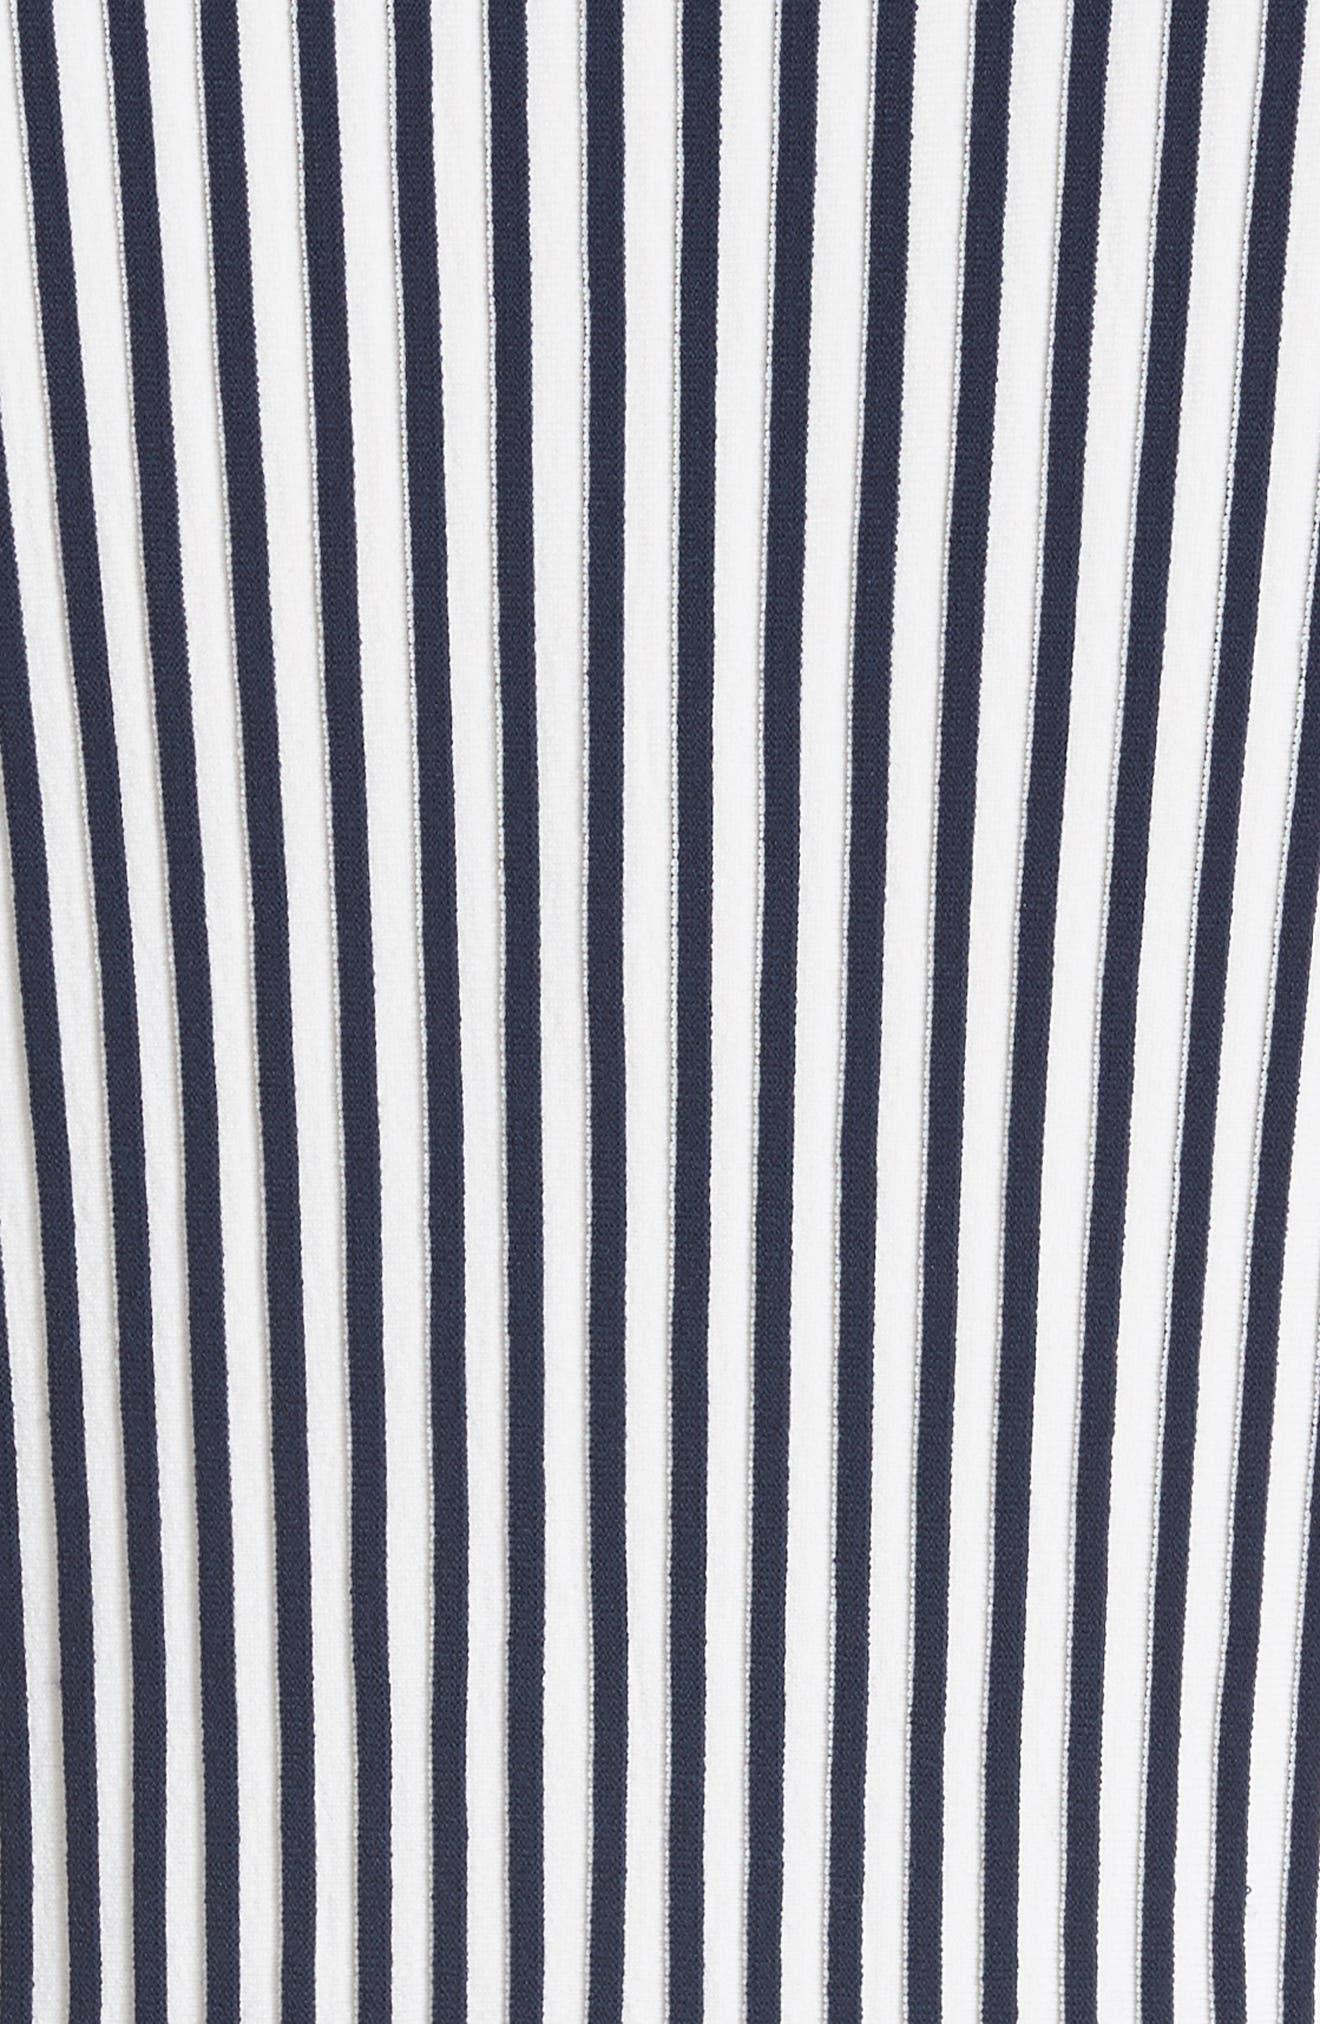 Stripe Knit Day Dress,                             Alternate thumbnail 6, color,                             Navy / Chalk